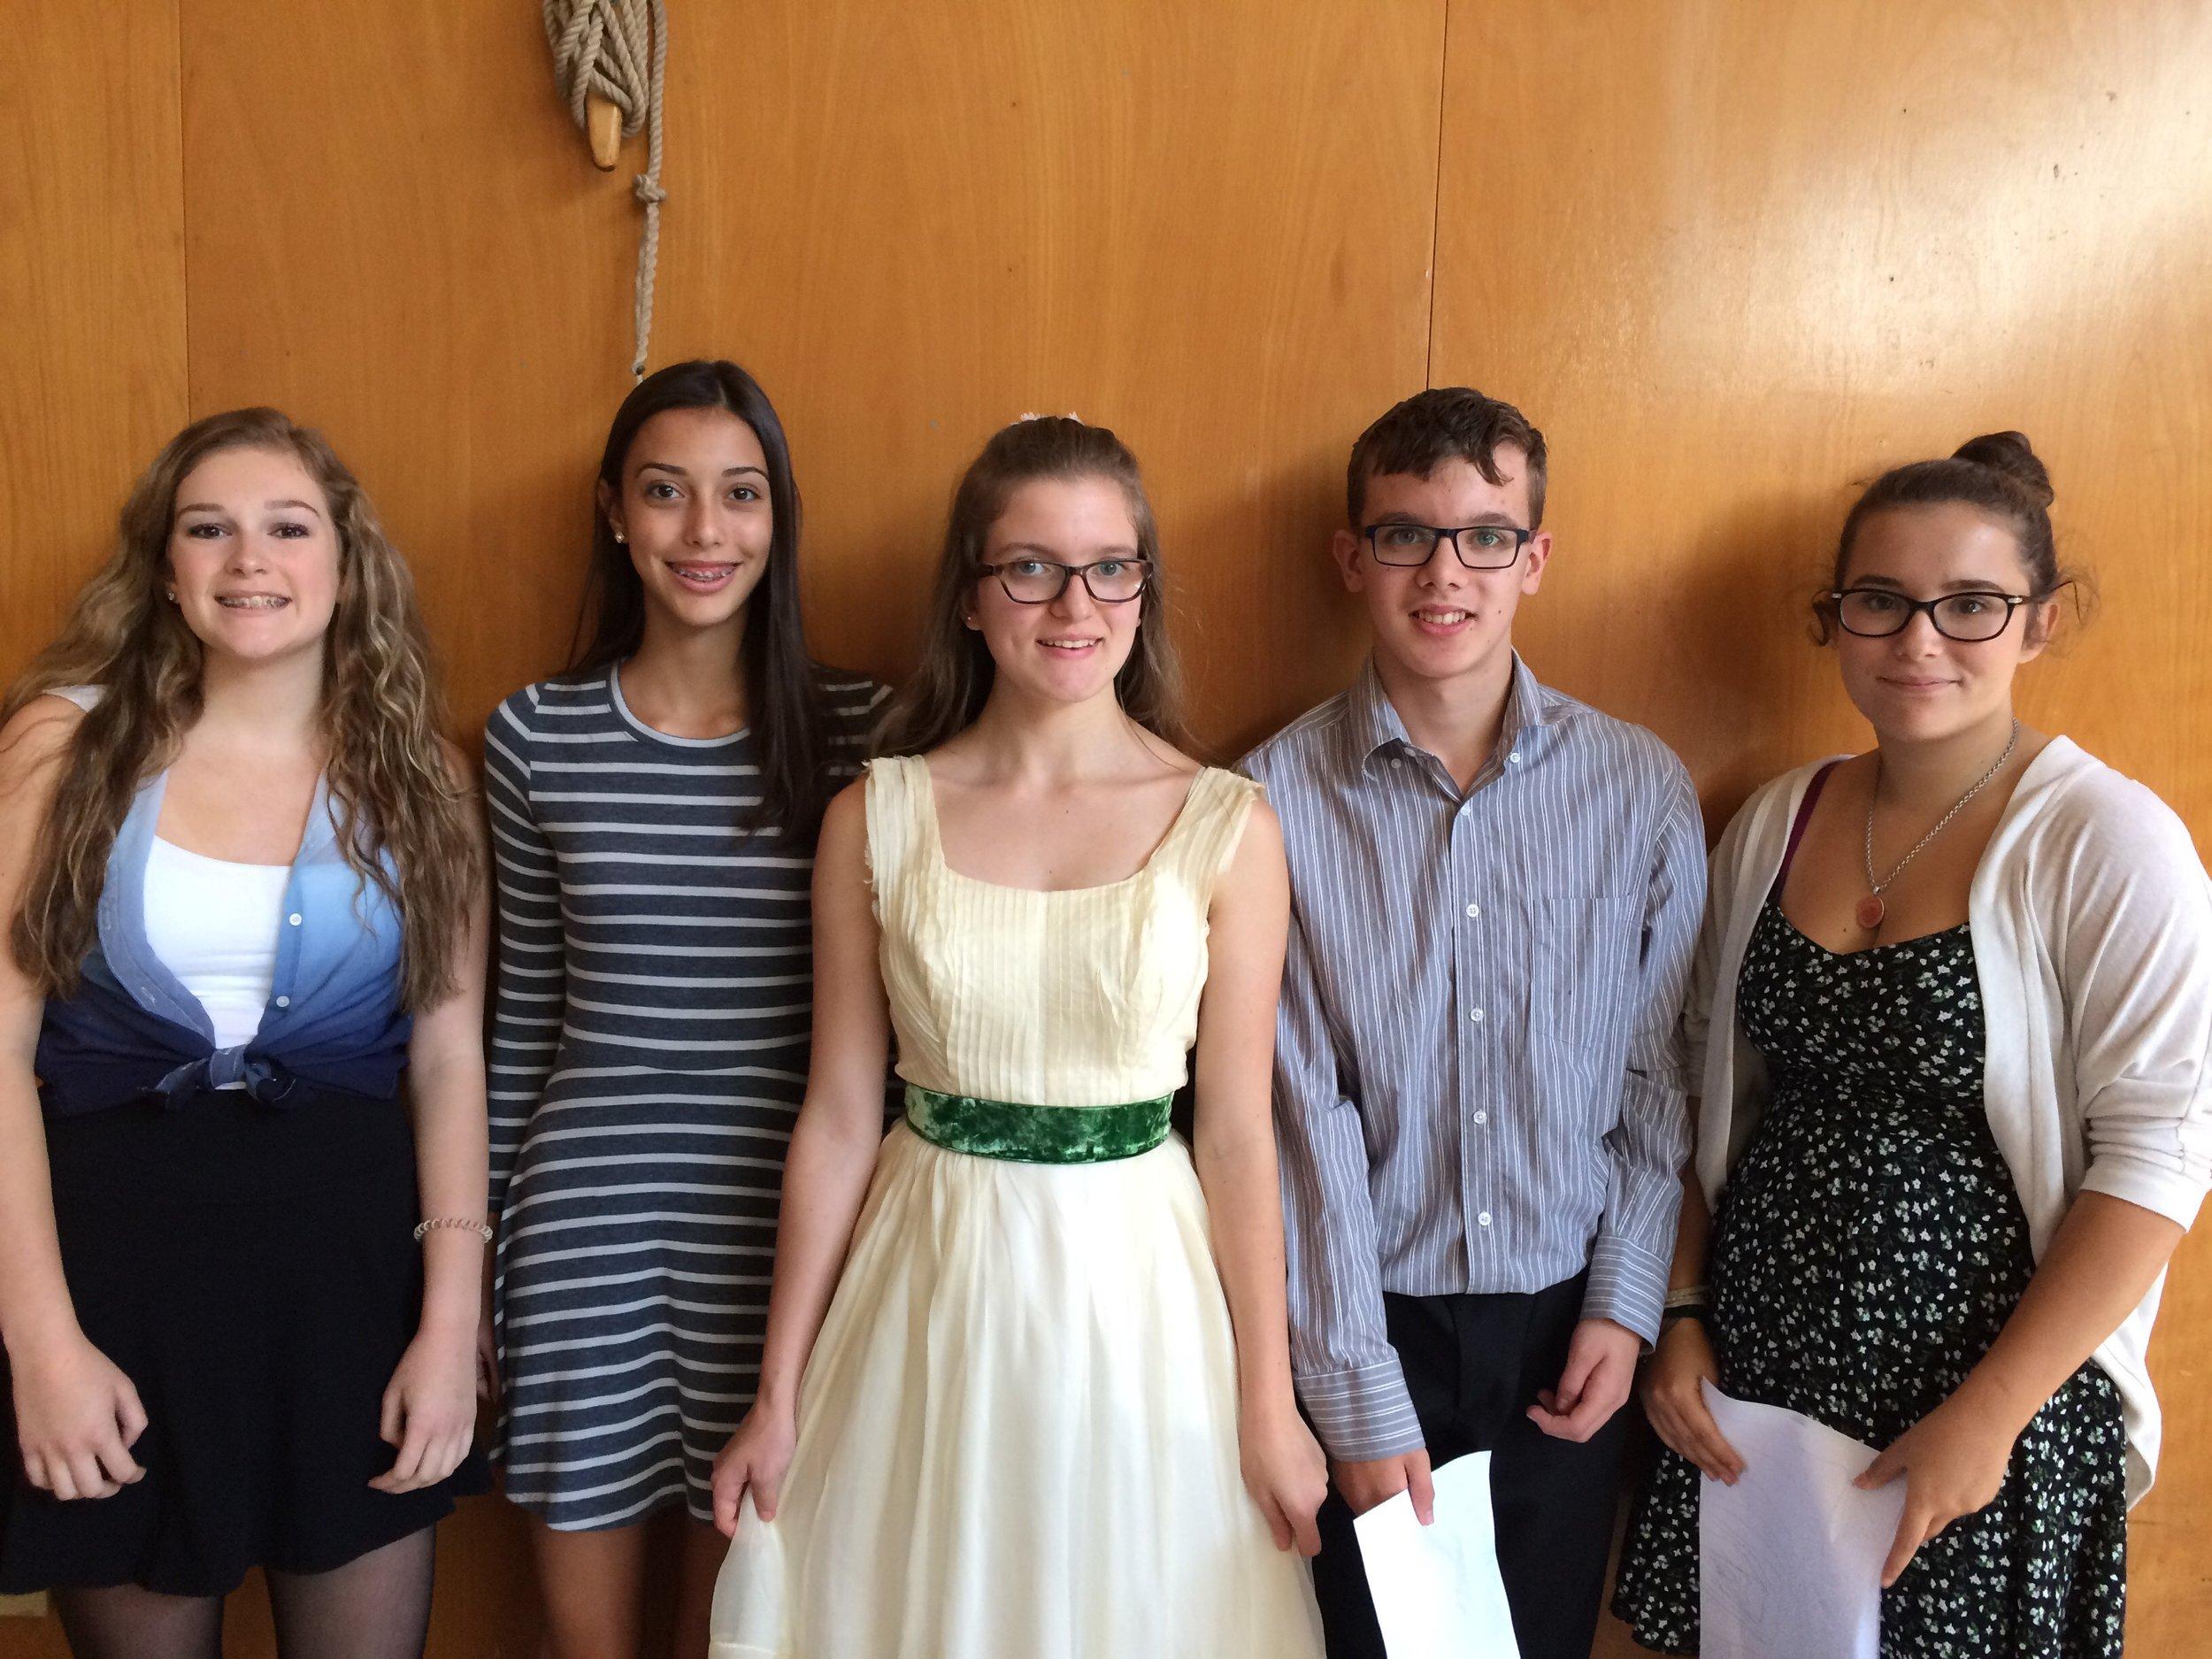 Sunday School Youth Teachers